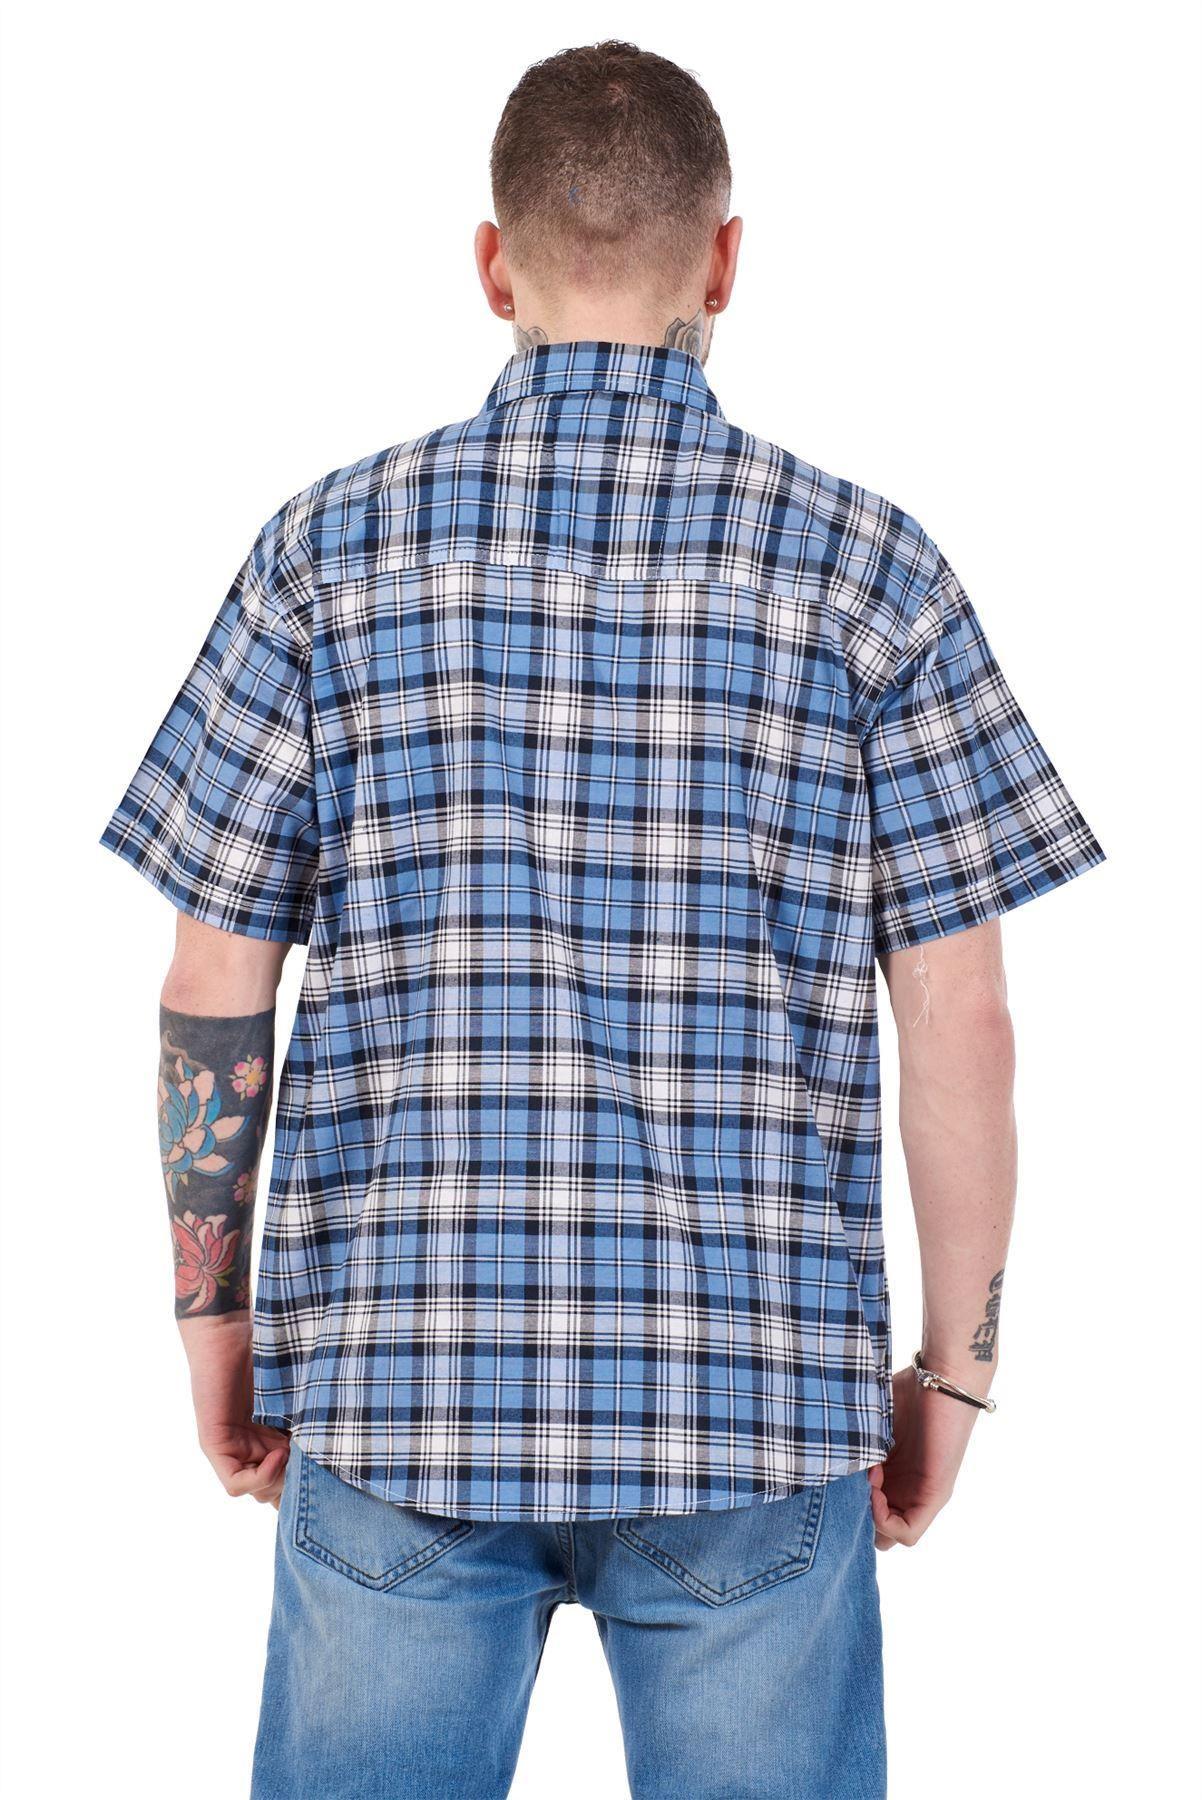 Mens-Regular-Big-Size-Shirts-Checked-Cotton-Blend-Casual-Short-Sleeve-Blue-M-5XL thumbnail 31